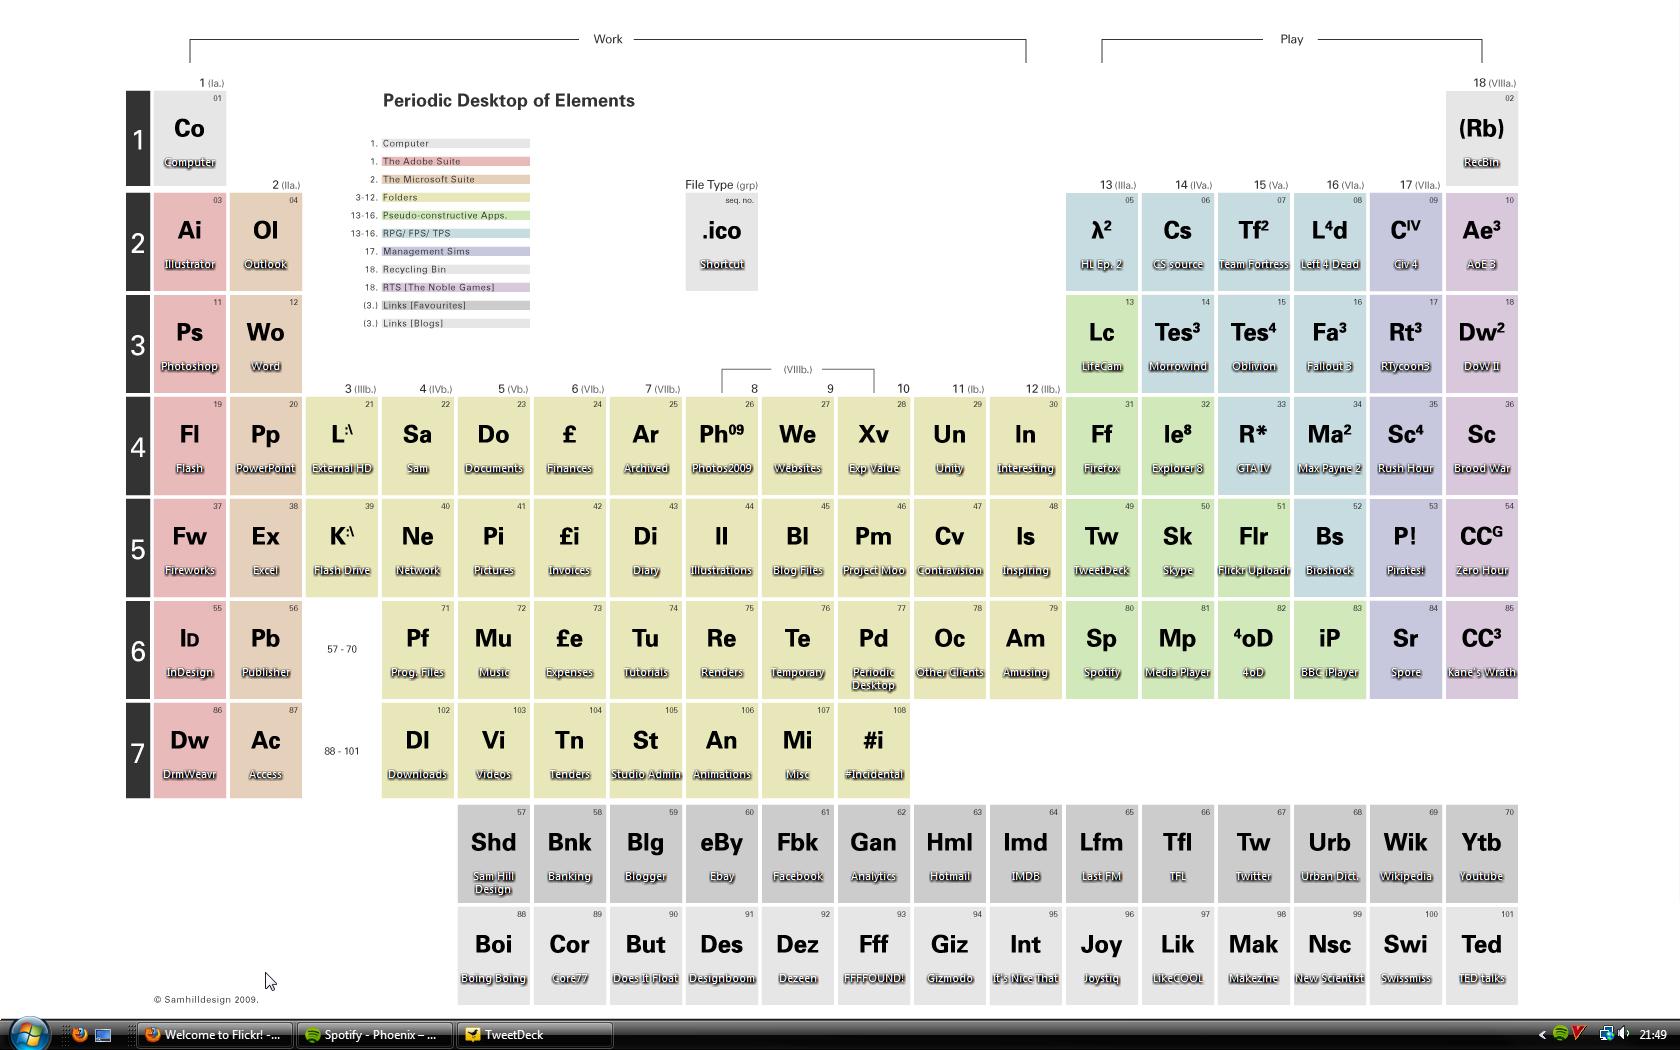 Periodic Table Of The Elements HD Wallpaper Source WallpaperSafari